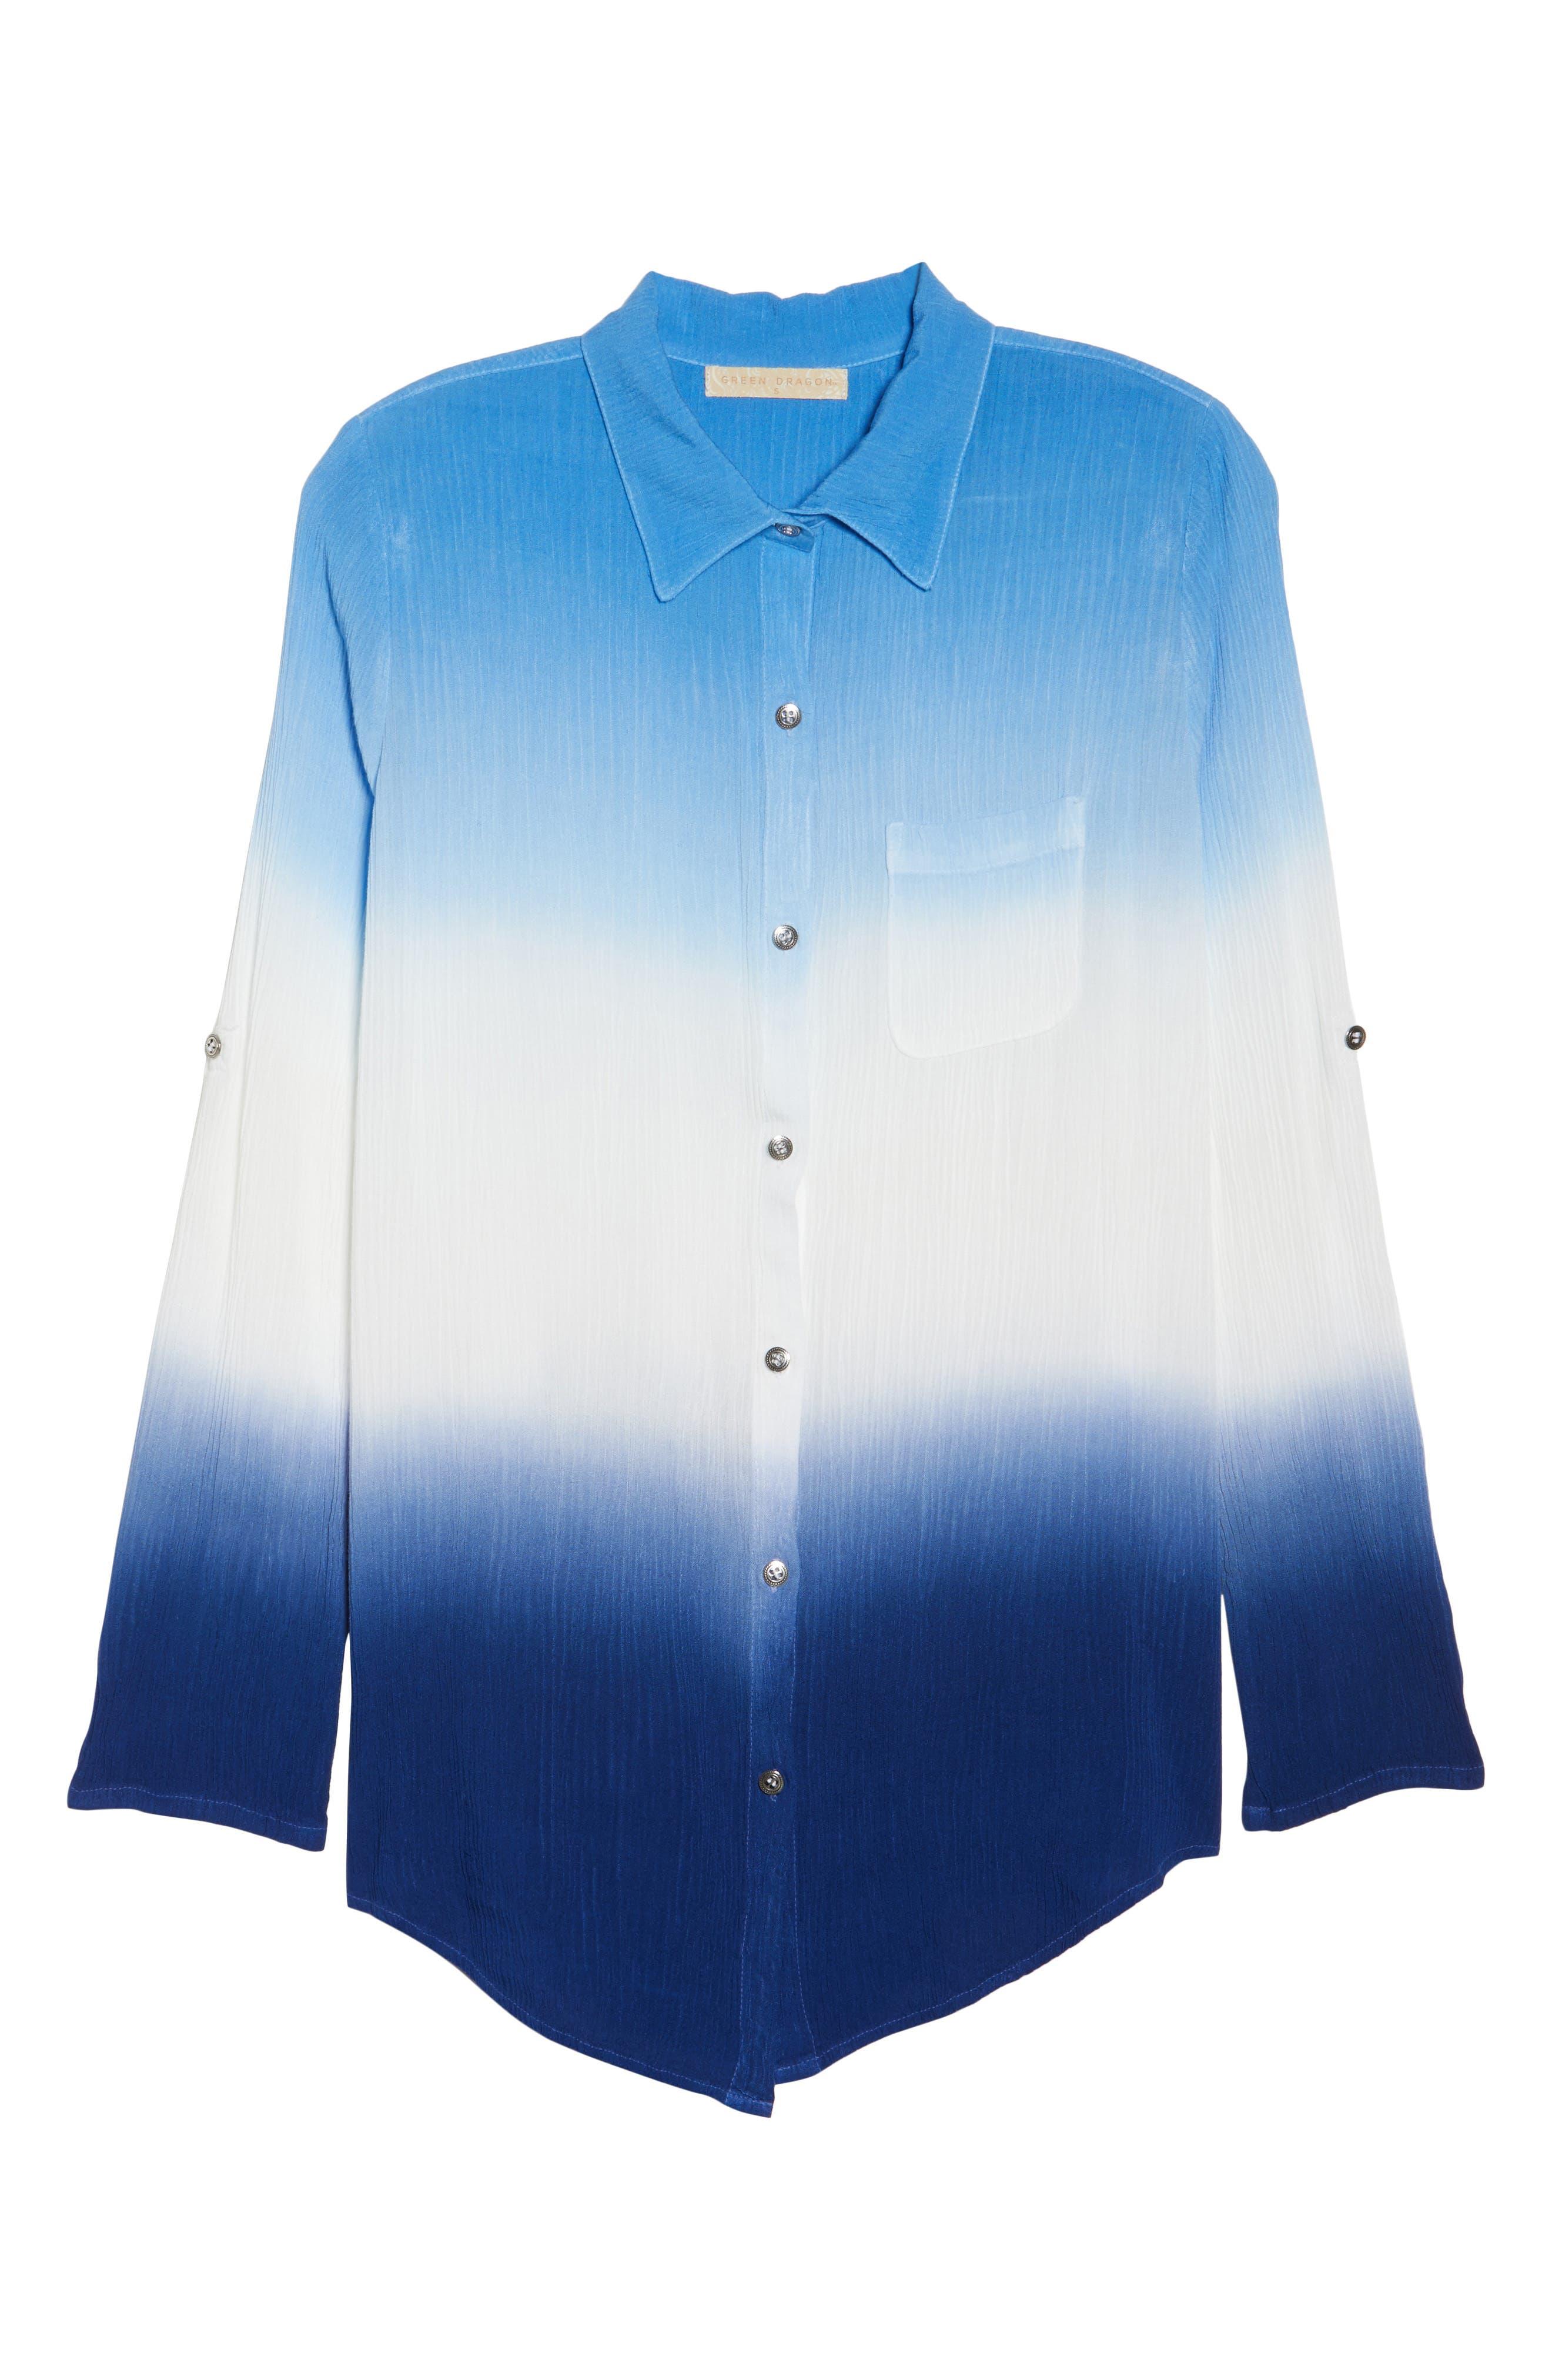 Big Sur Dip Dyed Cover-Up Boyfriend Shirt,                             Alternate thumbnail 5, color,                             Indigo